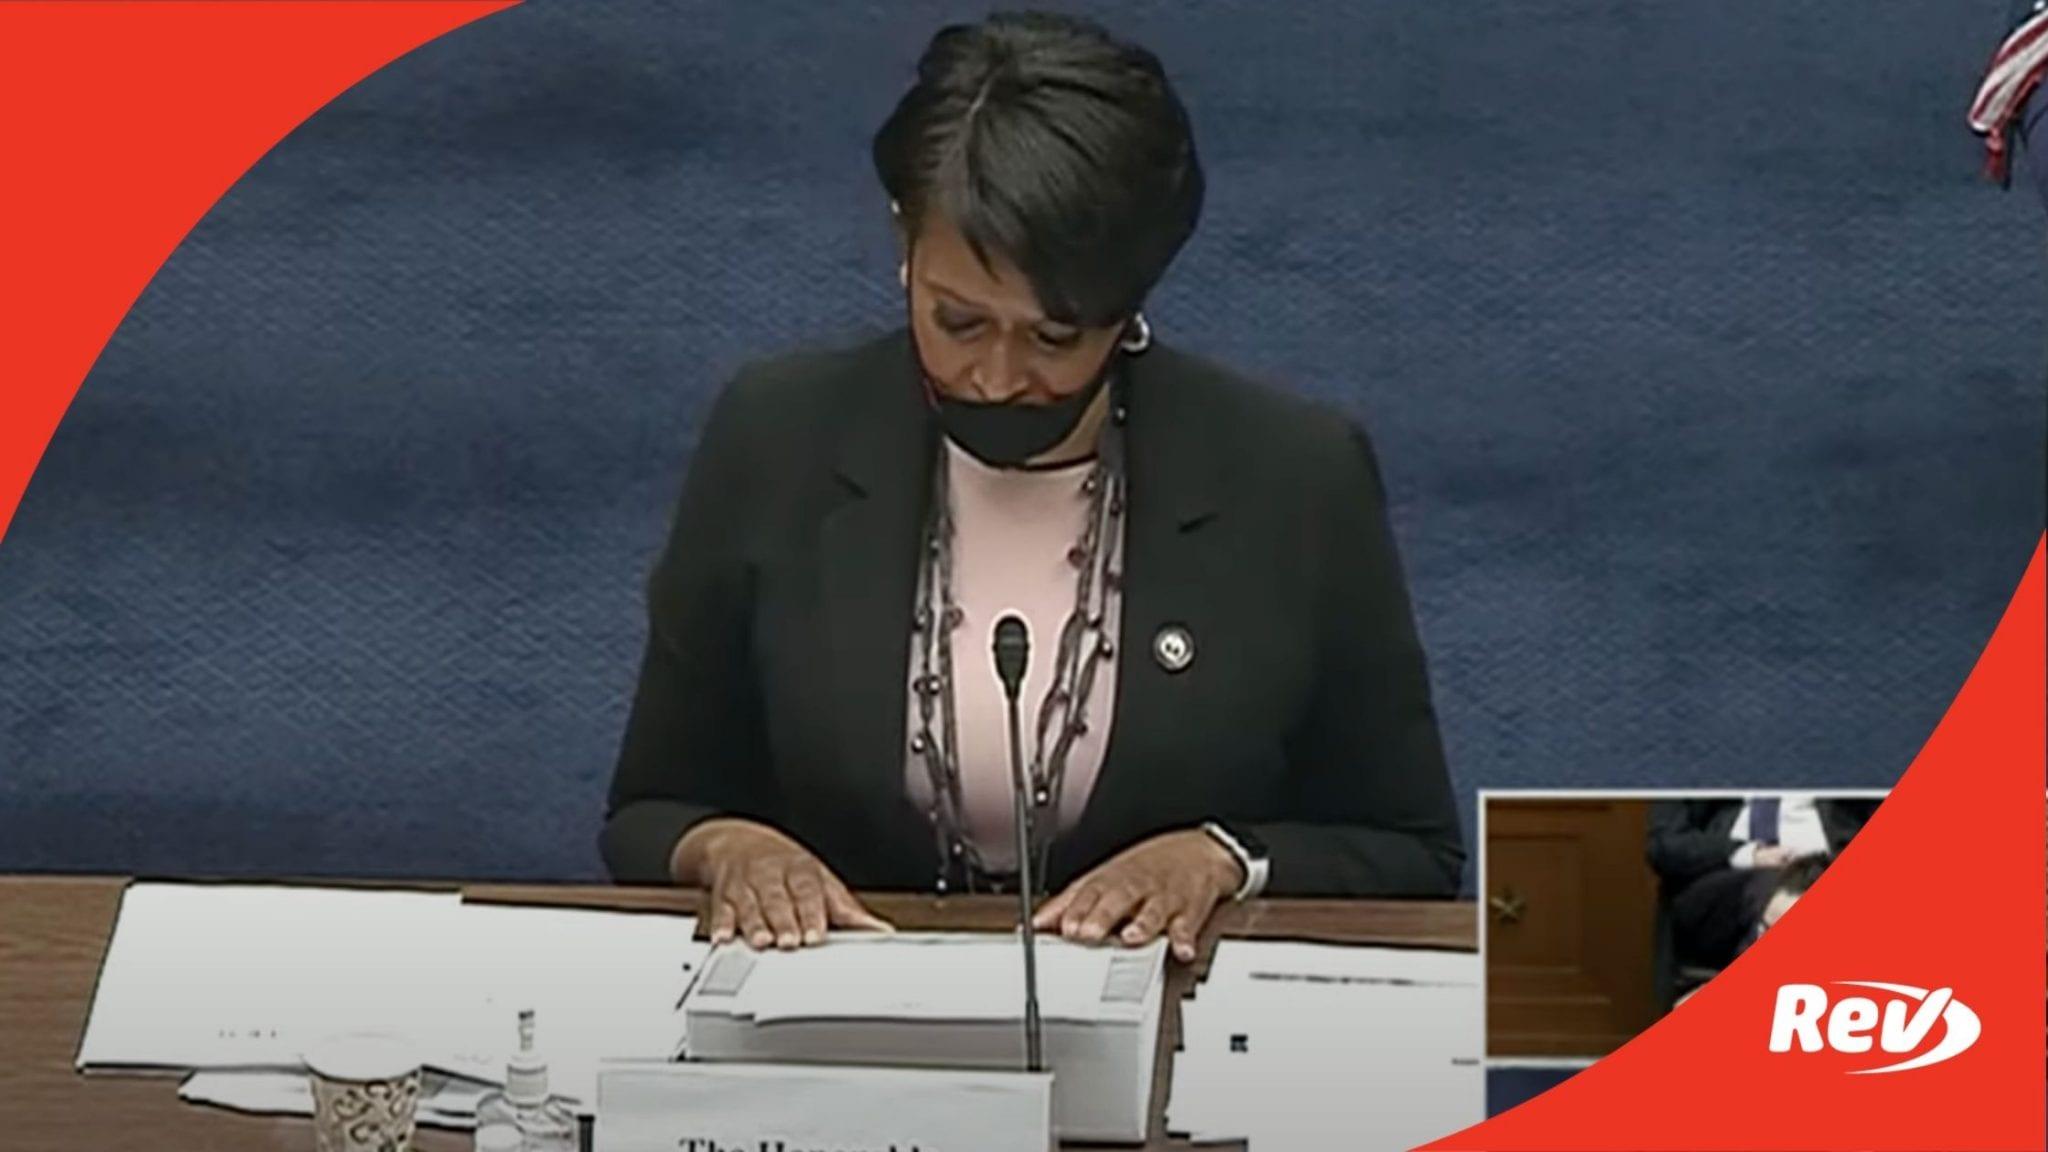 Muriel Bowser Opening Statement D.C. Statehood